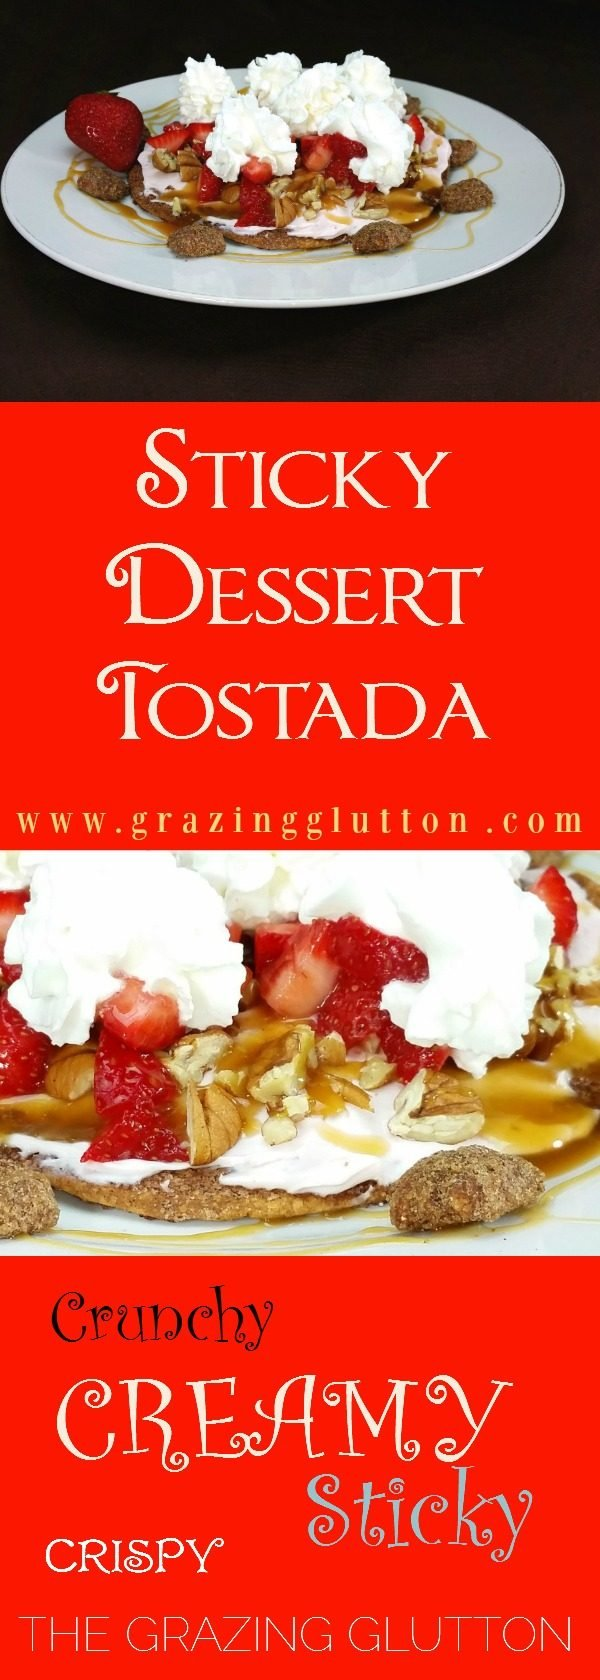 Dessert Tostada